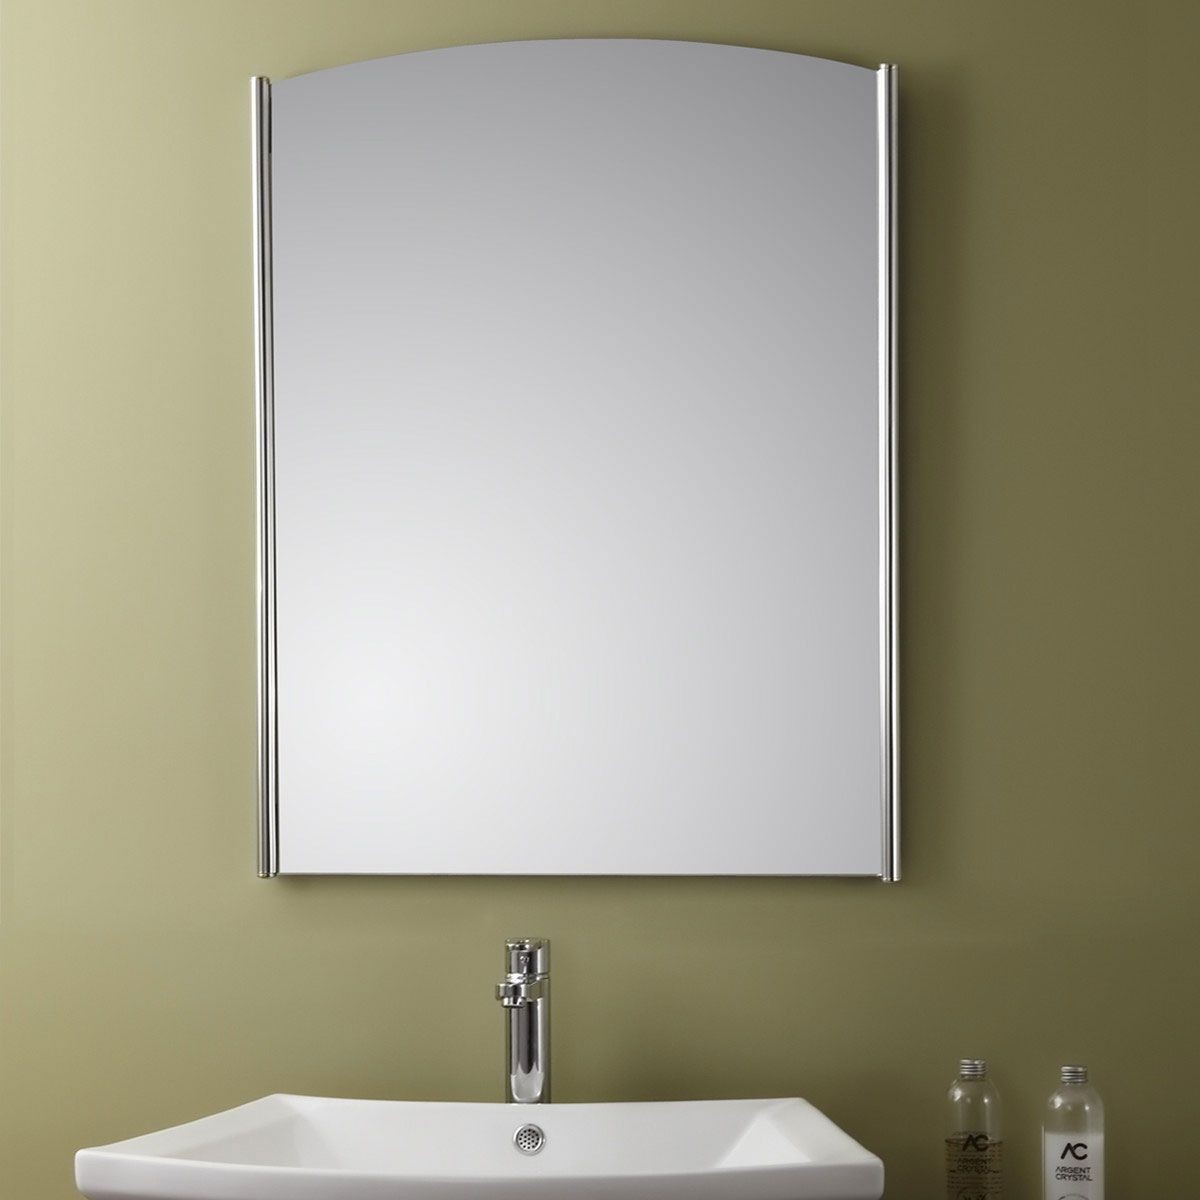 Vertical Stainless Steel Framed Bathroom Silvered Mirror ...